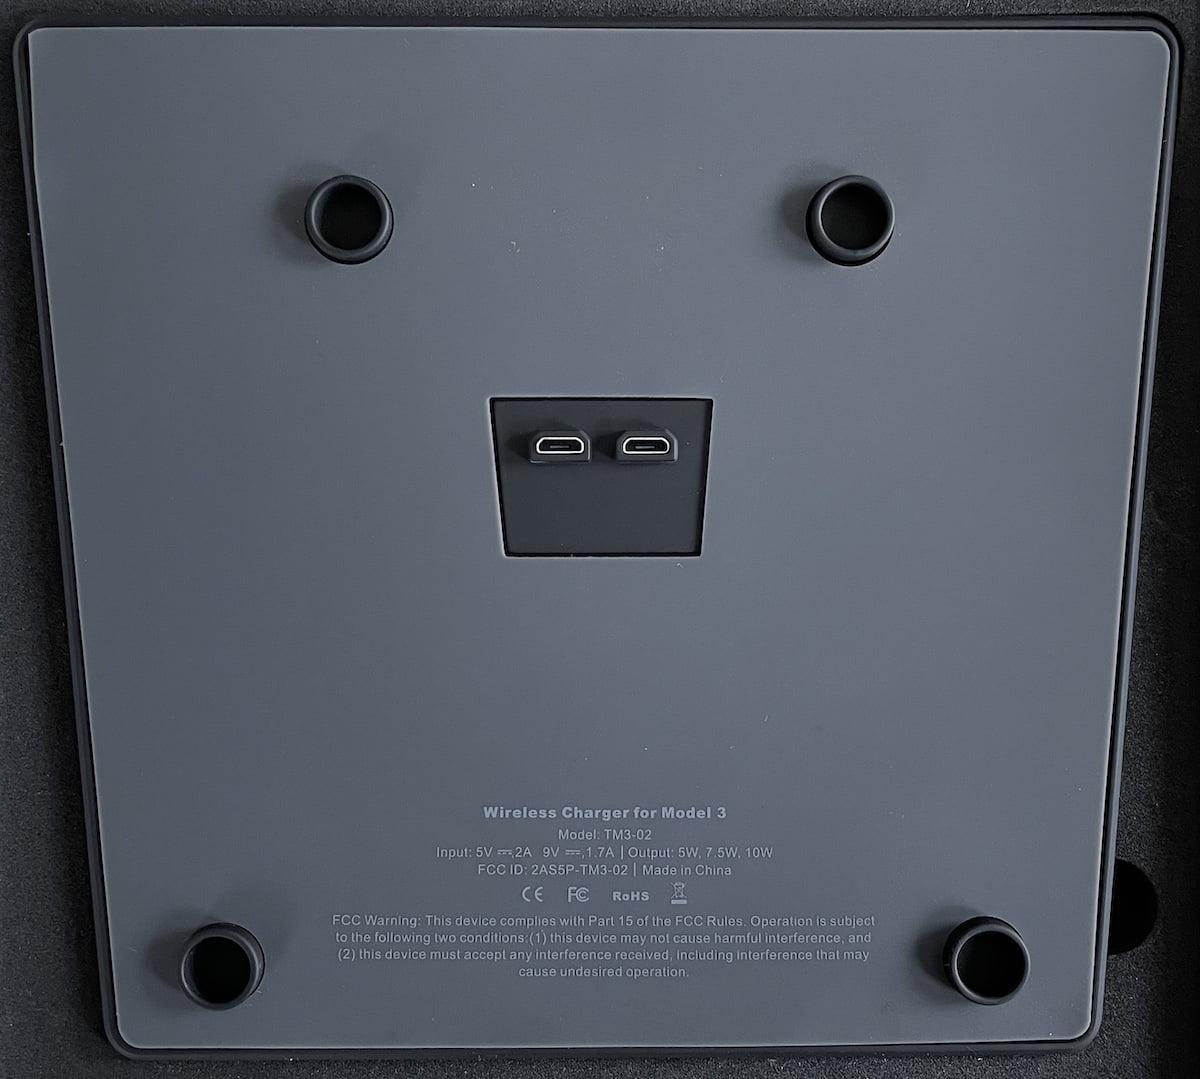 Model 3 - Draadloze telefoon oplader achterkant